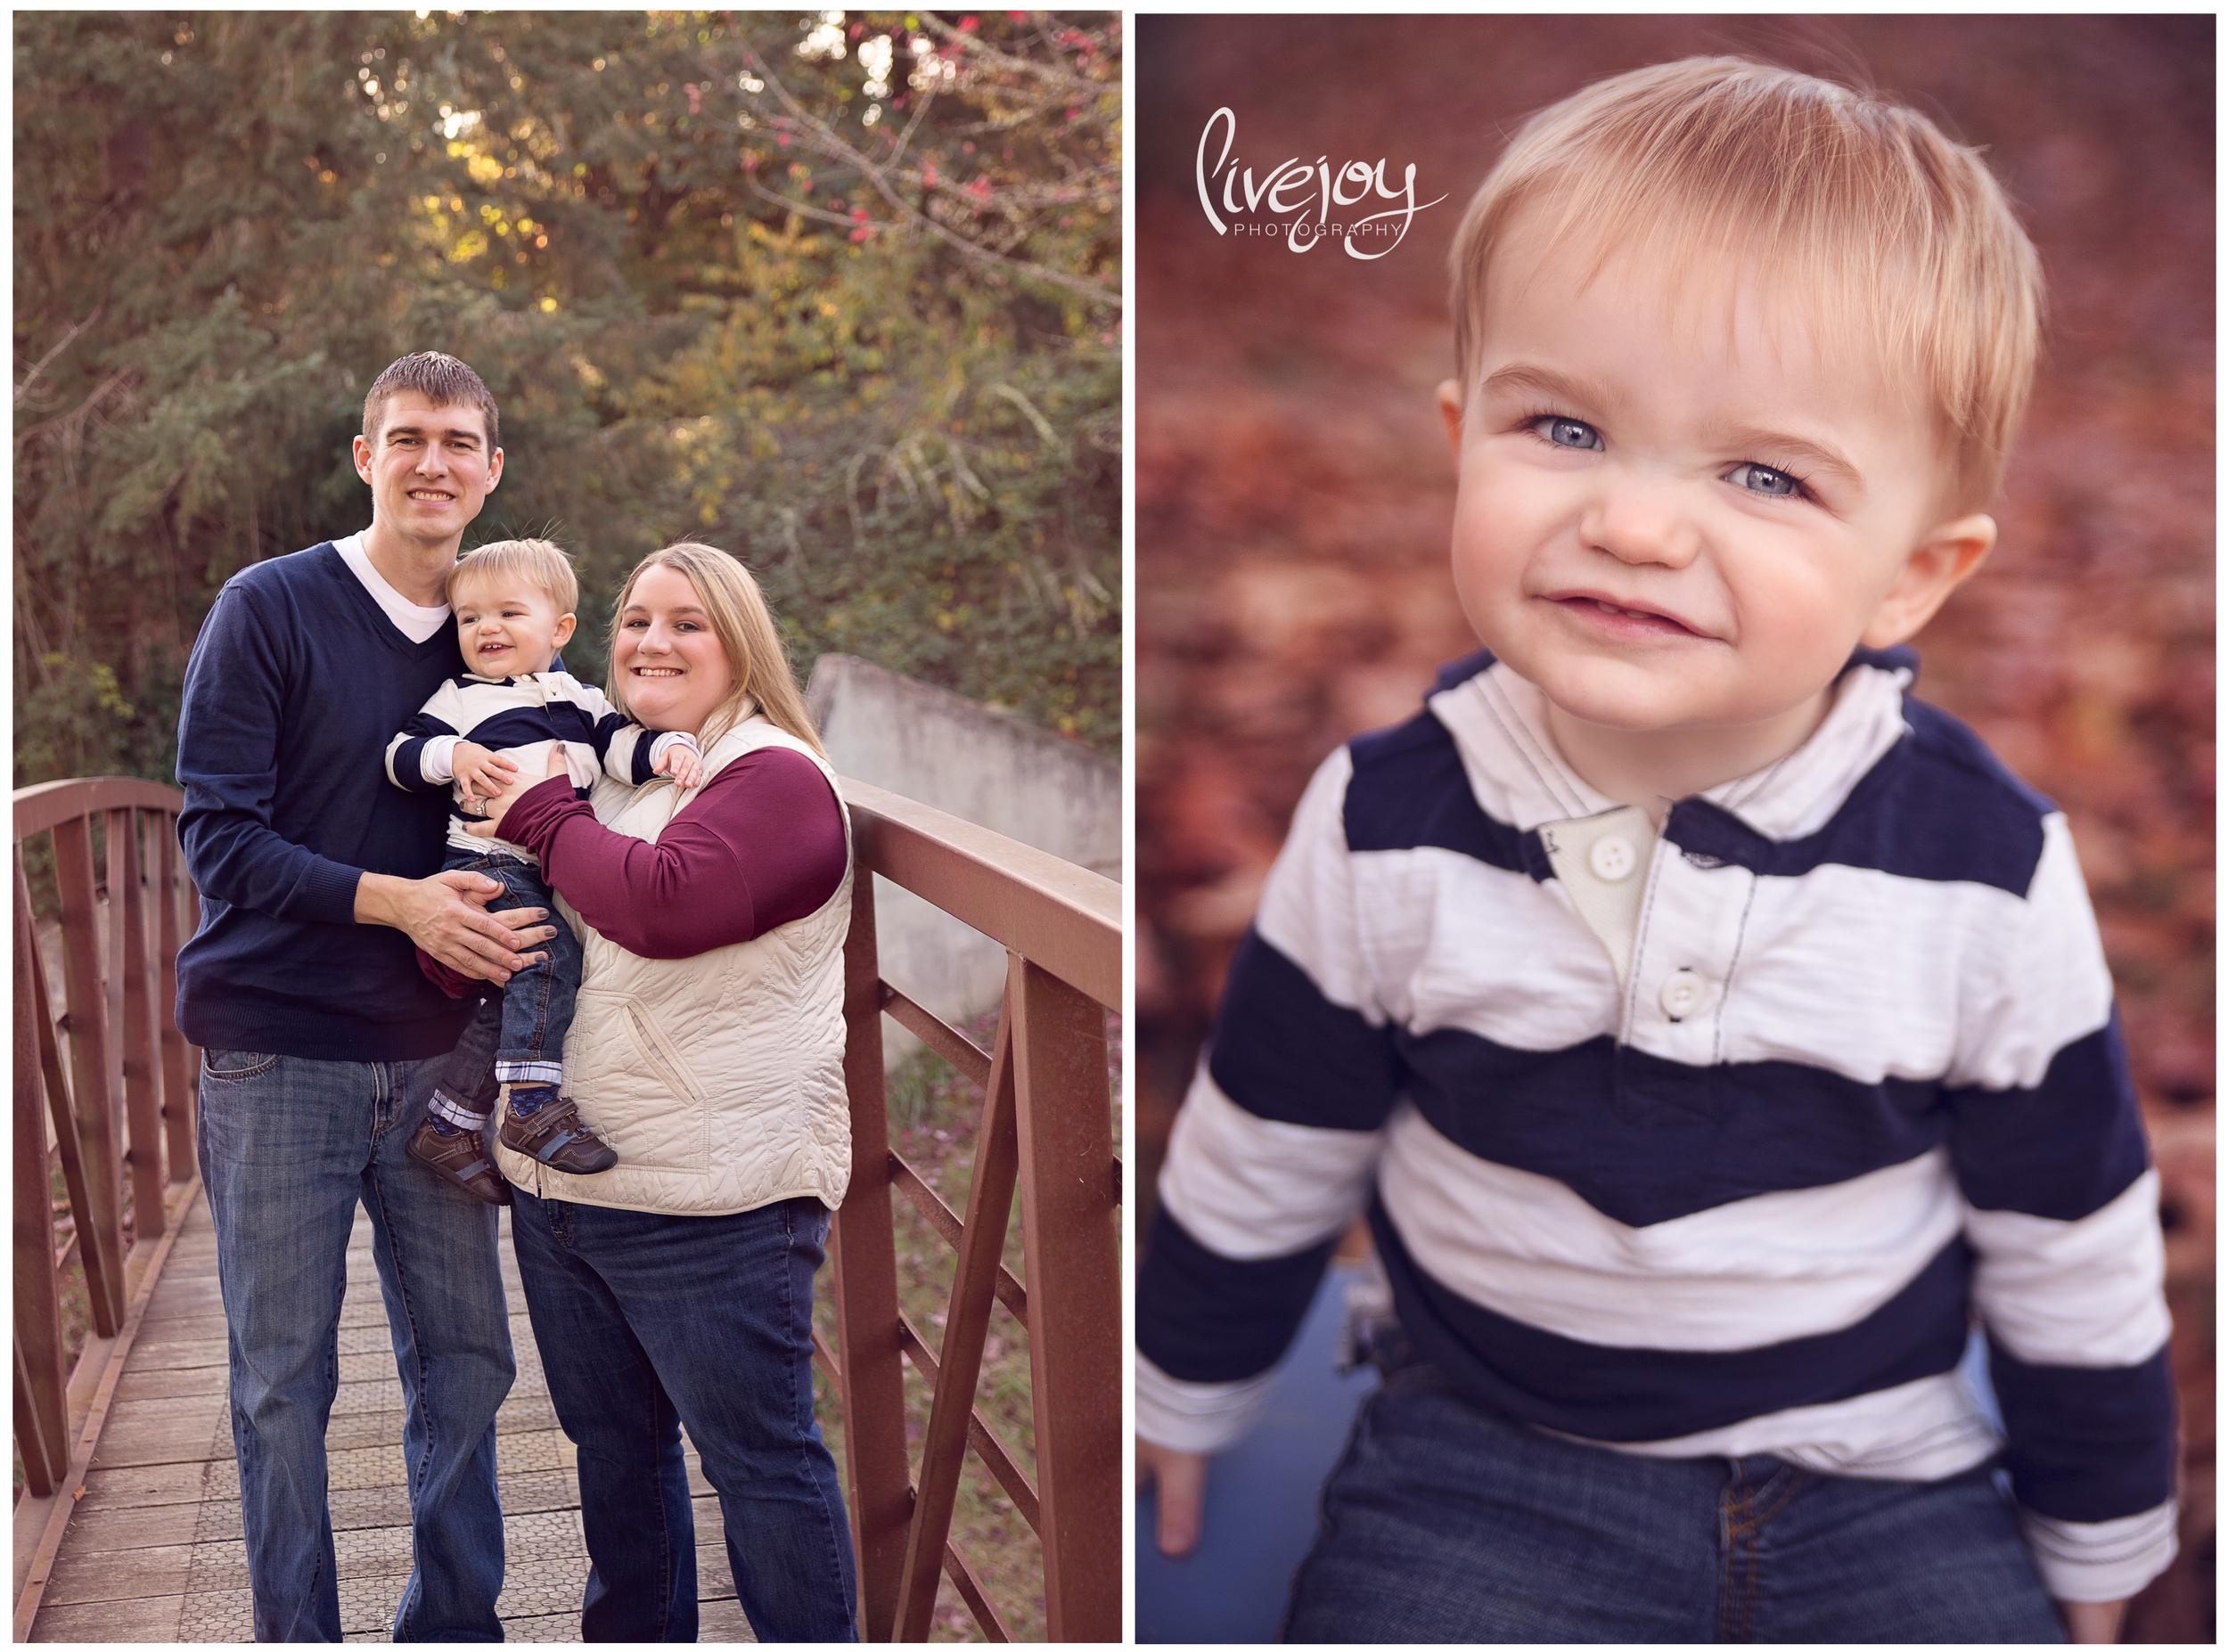 Family Photography | LiveJoy Photography | Oregon